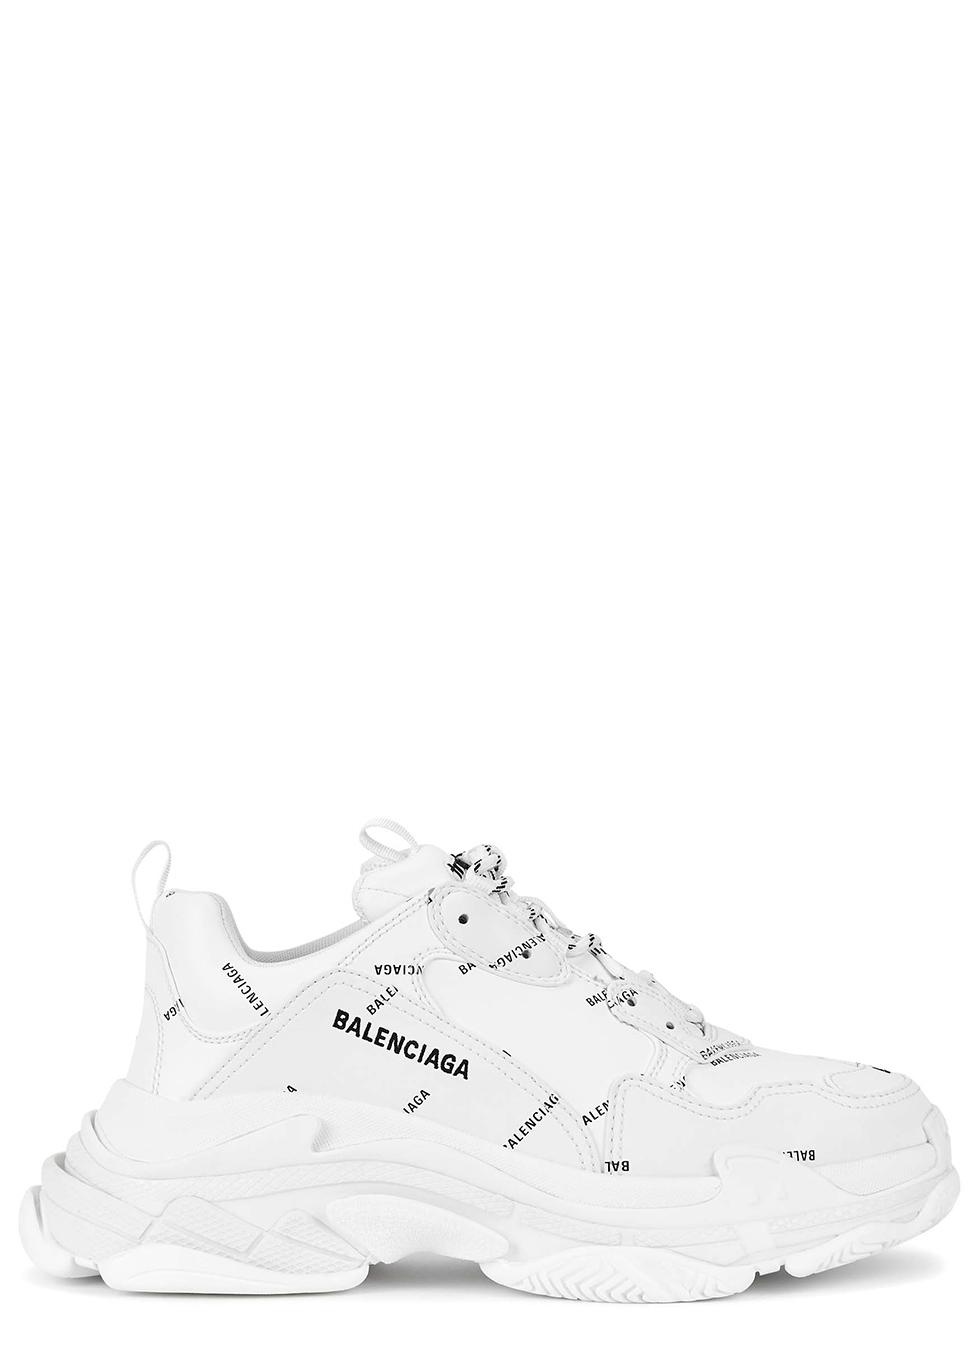 Balenciaga Bijenkorf Balenciaga schoenen Triple S Fila